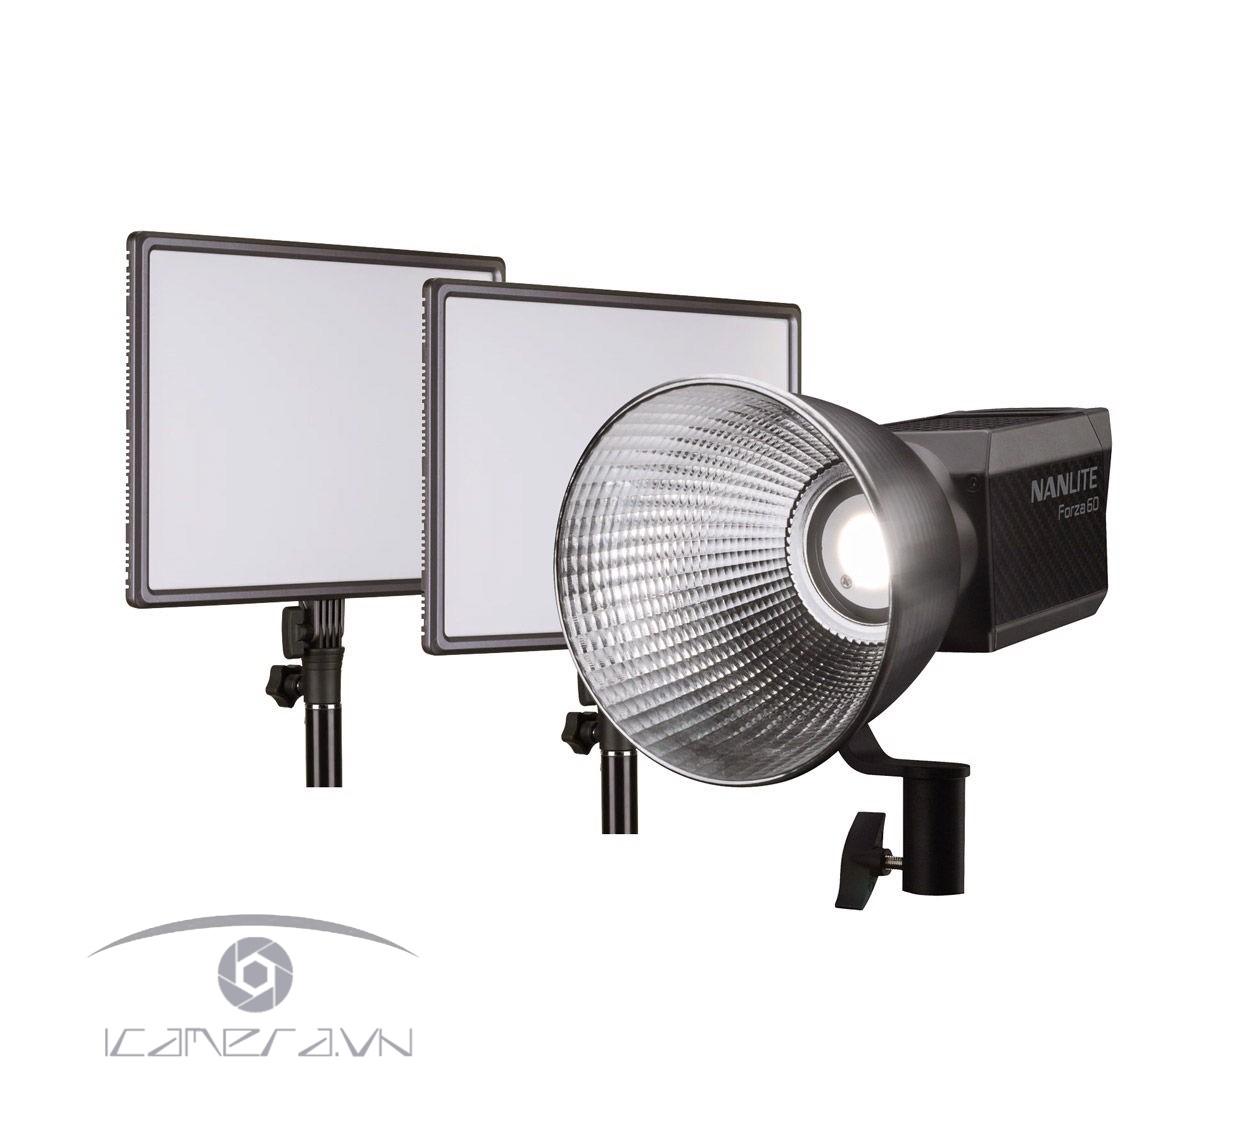 Bộ đèn led Nanlite Forza 60/ Lumipad 25 3Kit-P